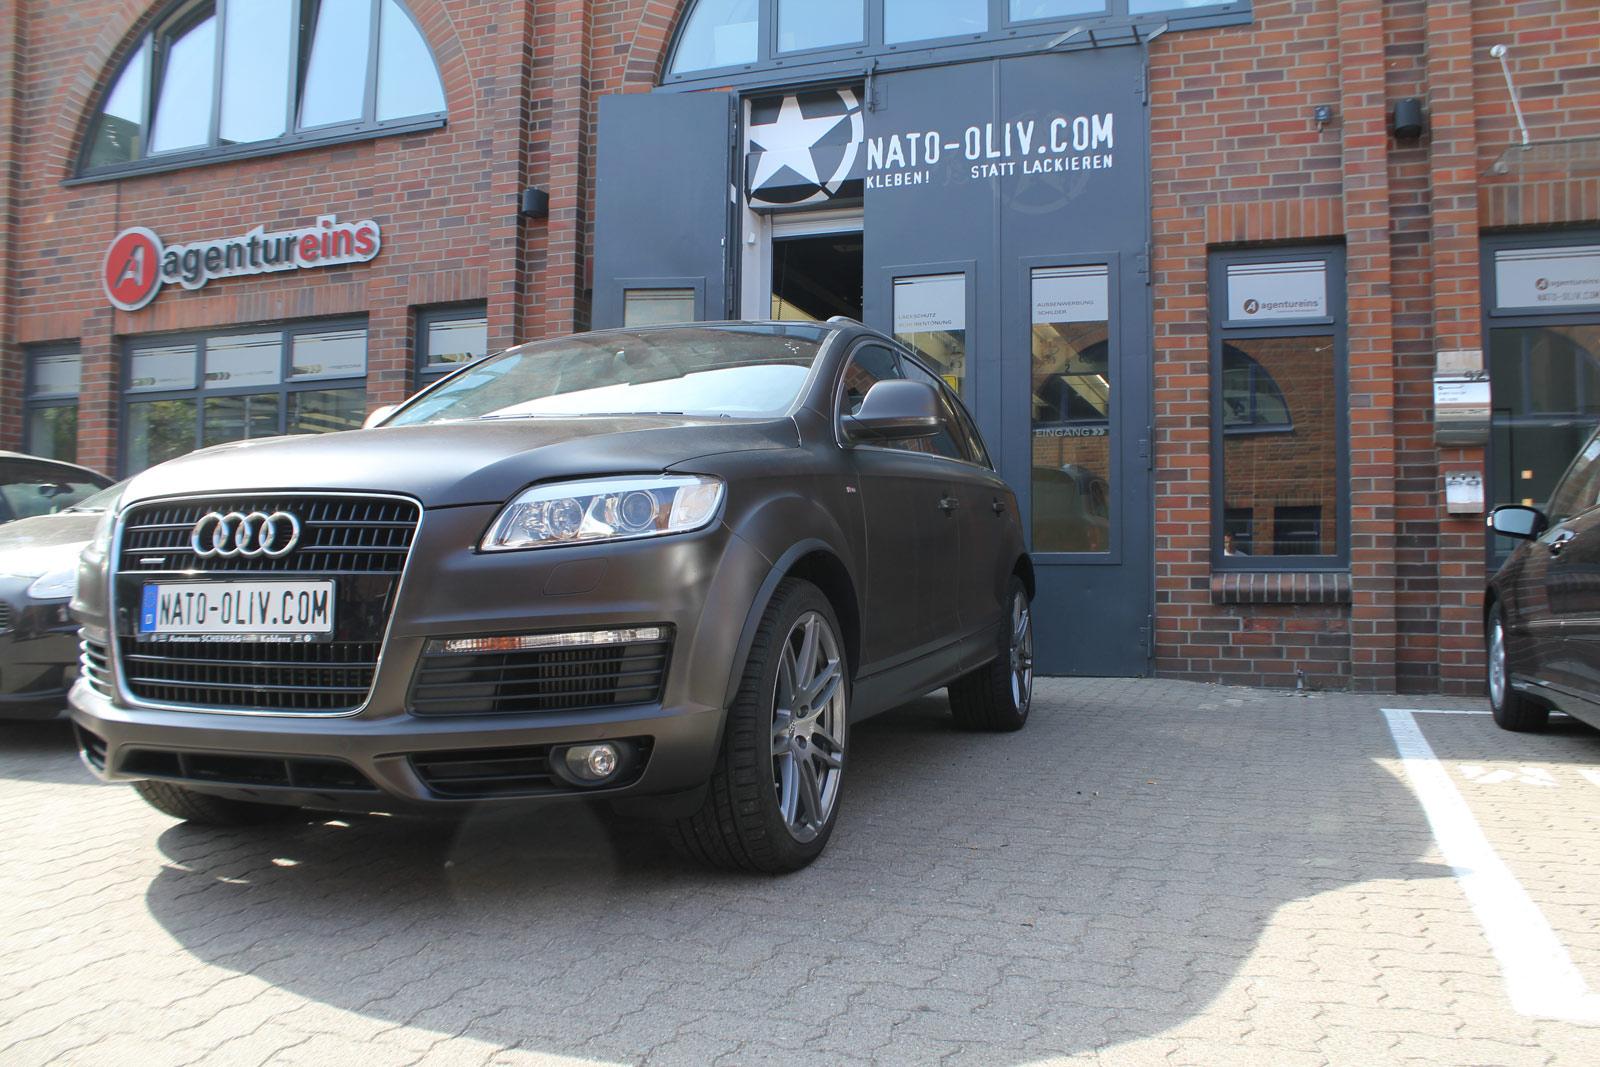 Audi_Q7_Folierung_Braun_Matt_Metallic_14